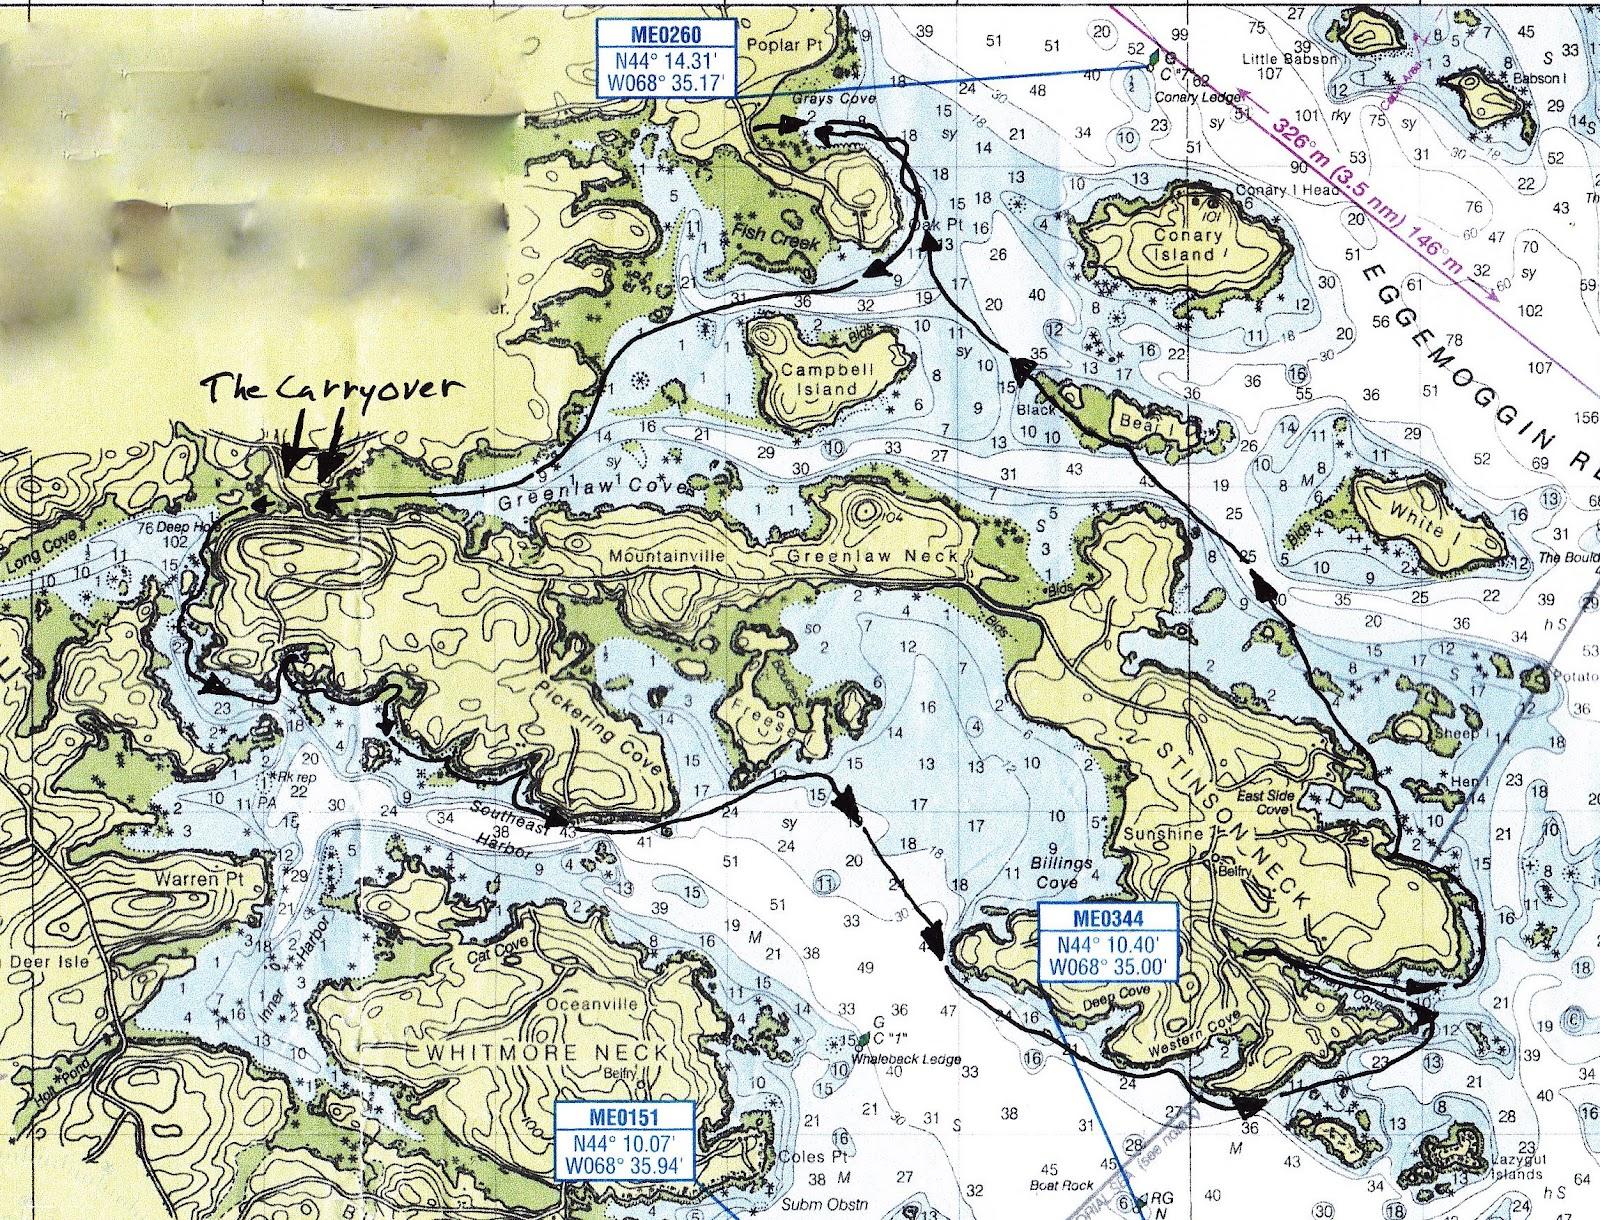 Sea kayak stonington around mountainville and stinson neck around mountainville and stinson neck nvjuhfo Image collections